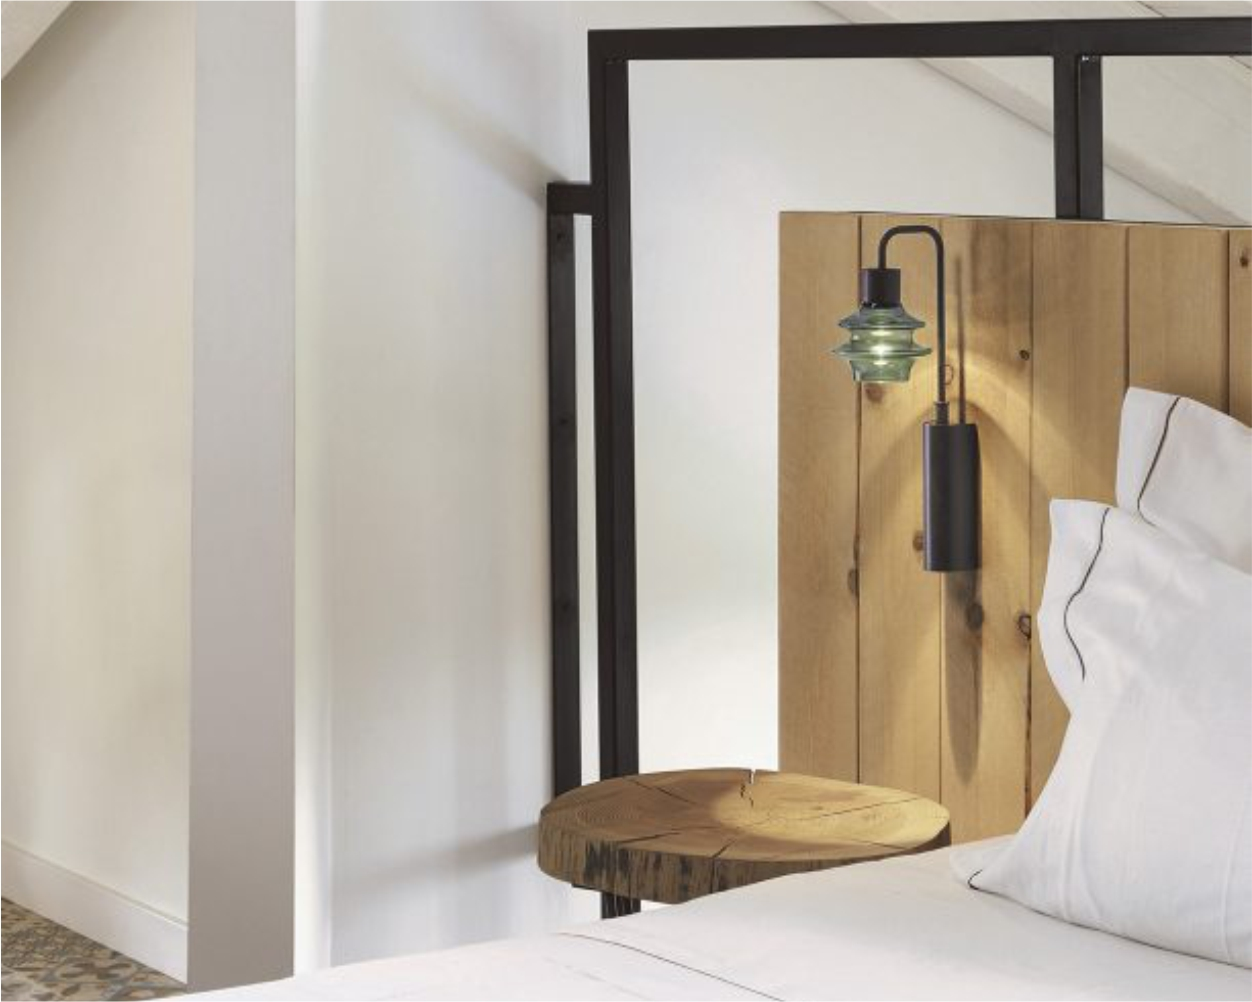 Lămpi pentru iluminat interior, cu fixare pe perete. Design interior